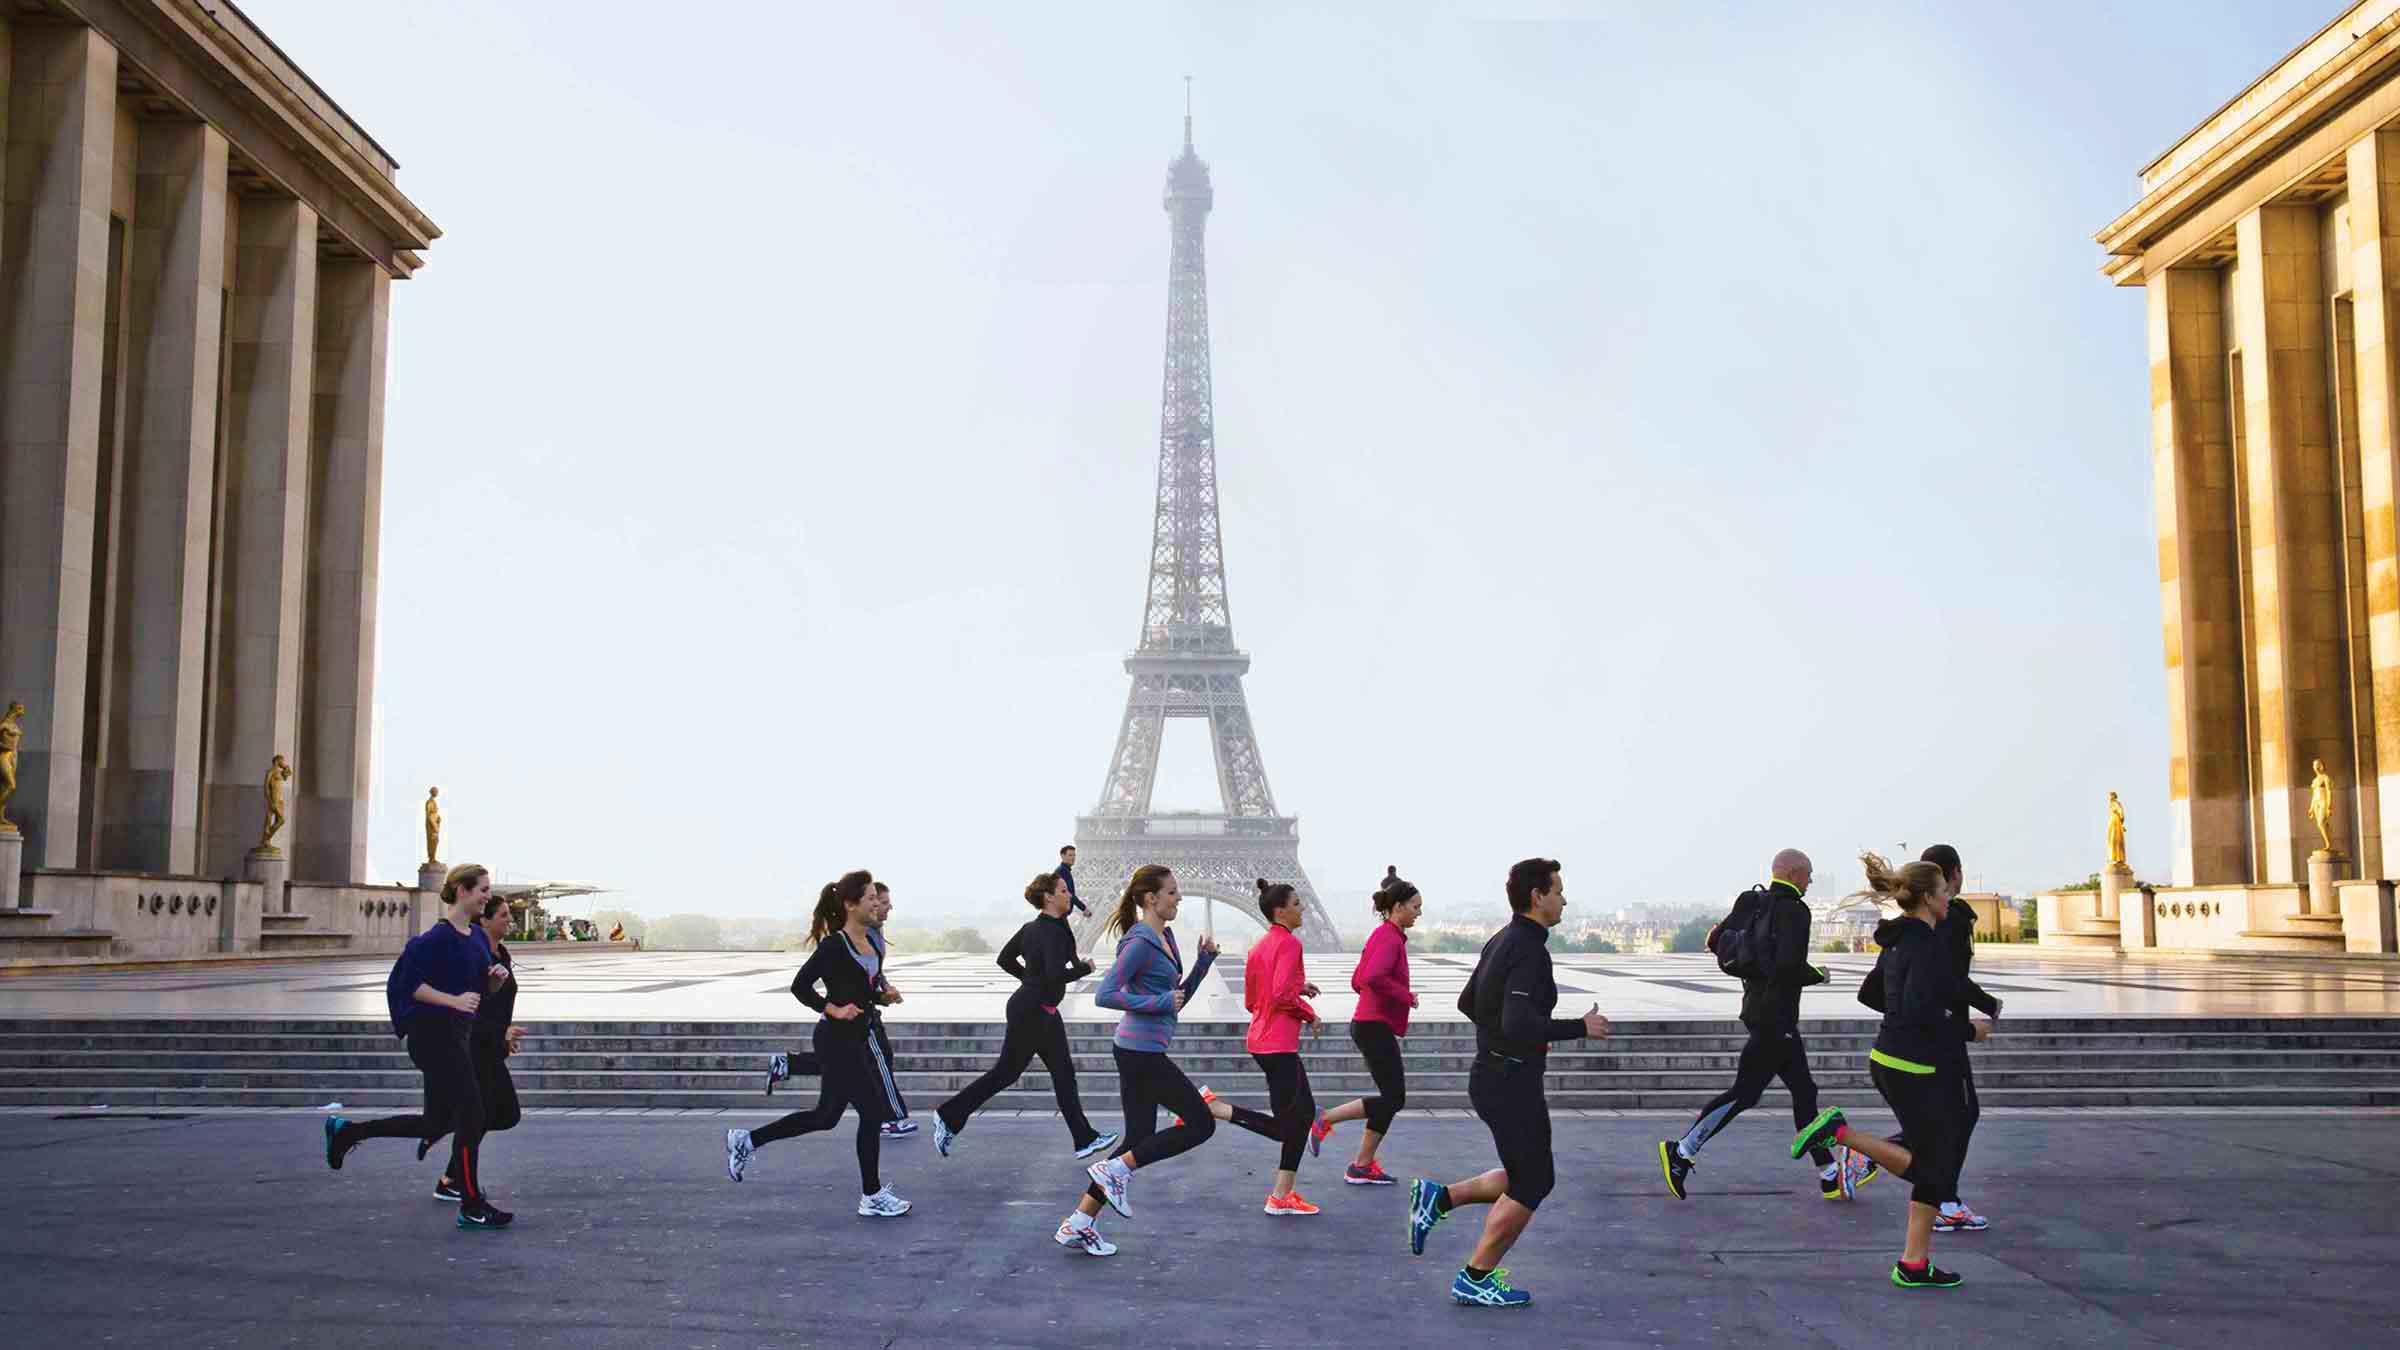 Four Seasons Hotel guests jogging past the Eiffel Tower—Paris, France